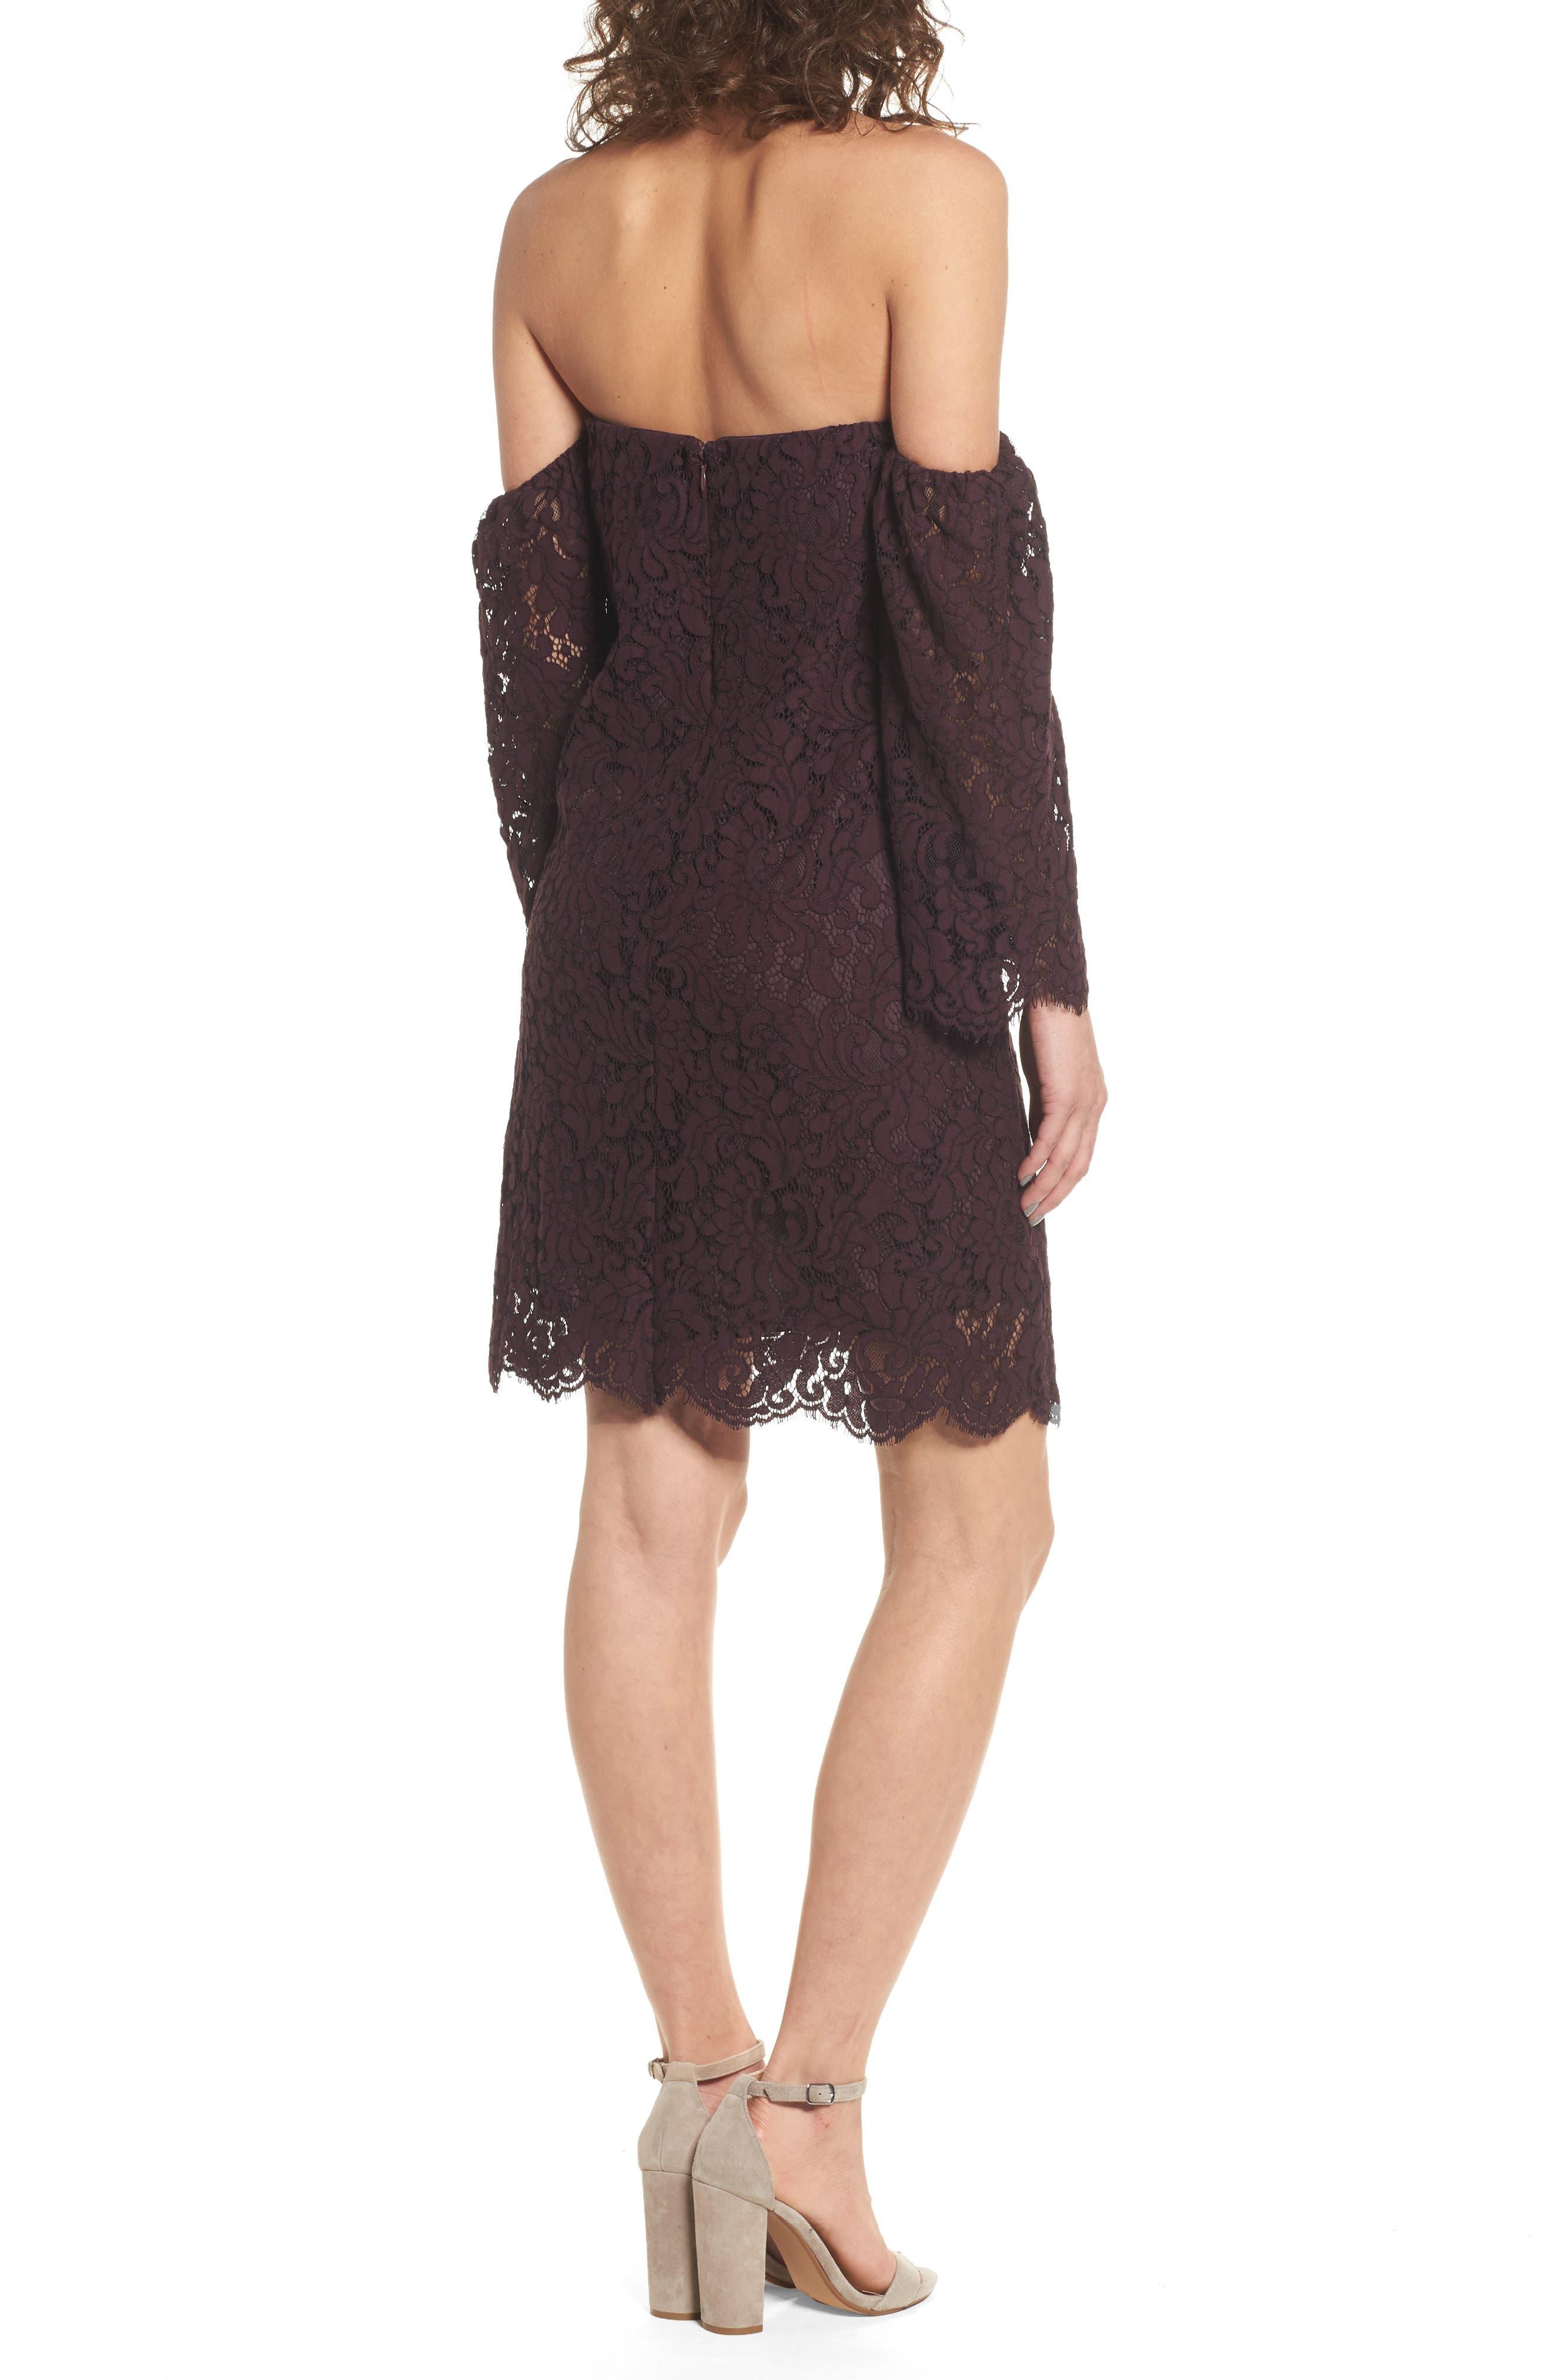 Adalira Off the Shoulder Lace Dress,                             Alternate thumbnail 2, color,                             930